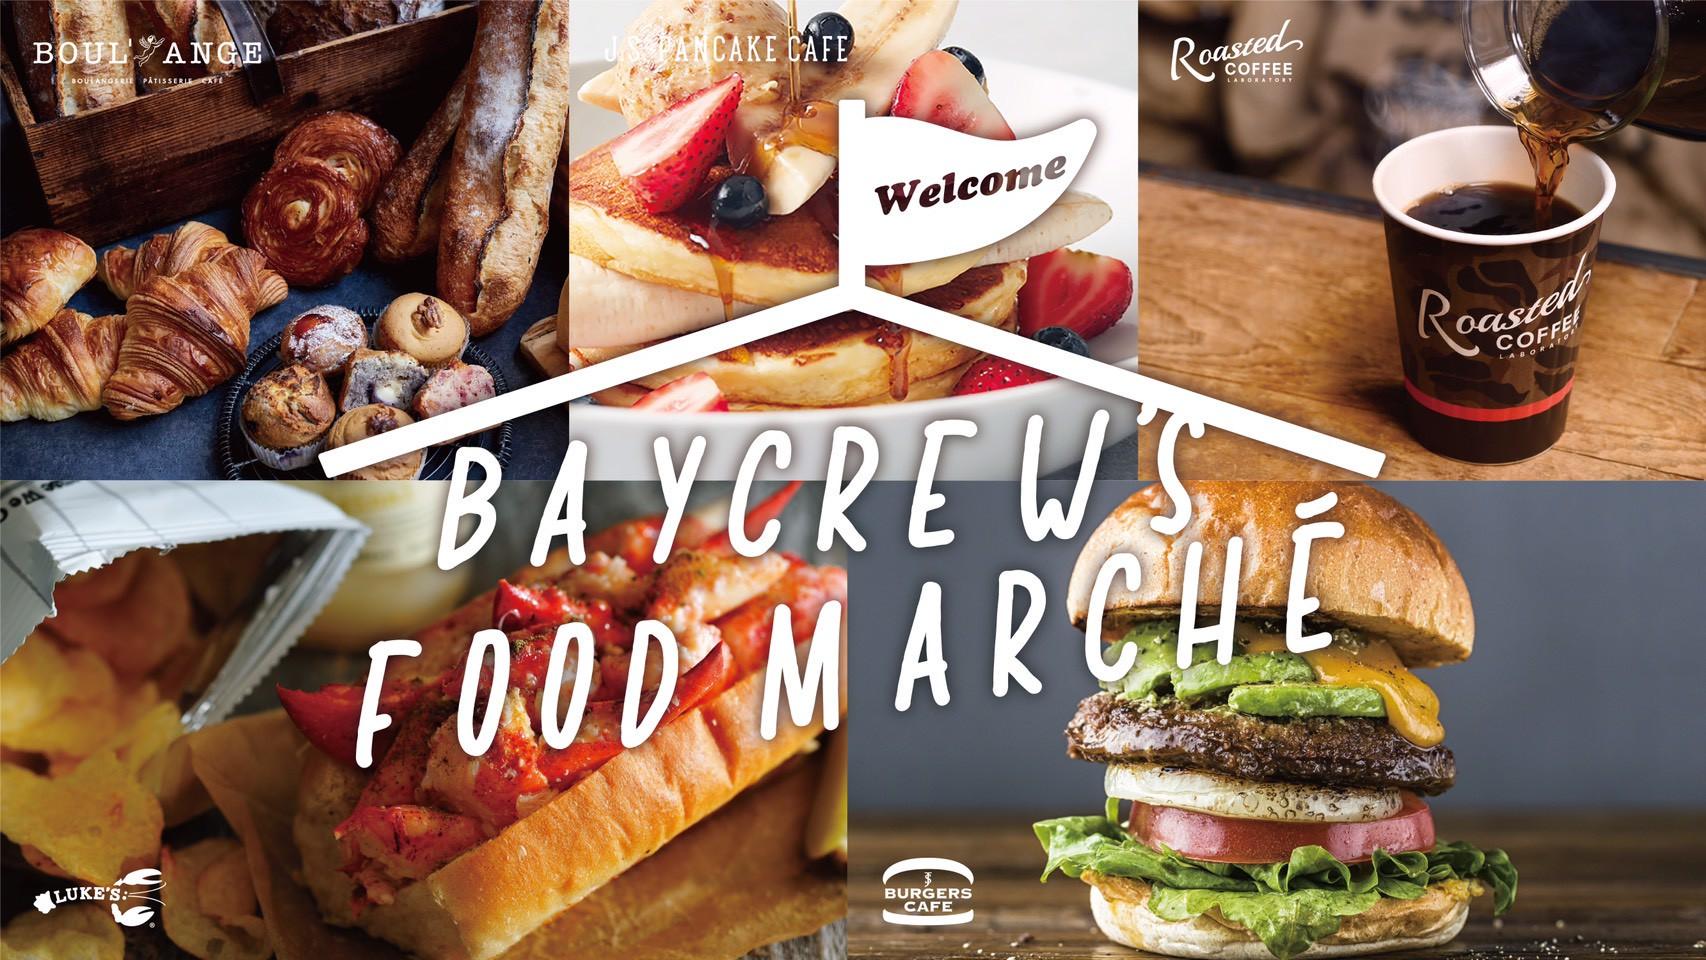 BAYCREW'S FOOD MARCHE